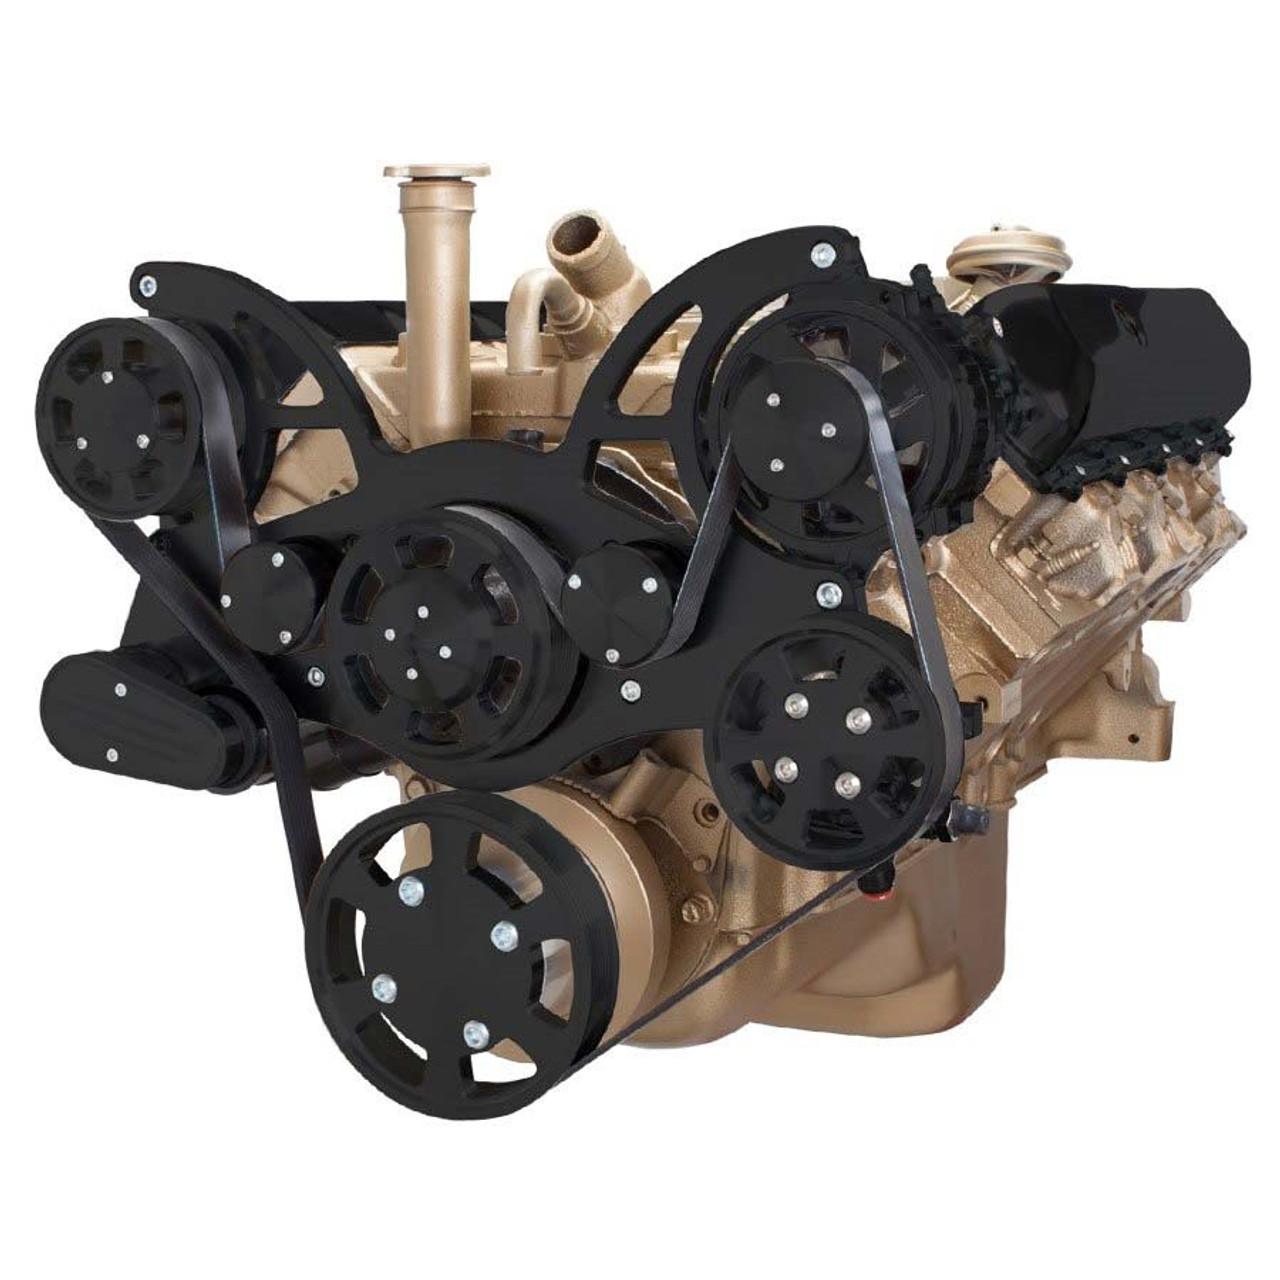 Stealth Black Serpentine System for Oldsmobile 350-455 - Power Steering &  Alternator - All Inclusive